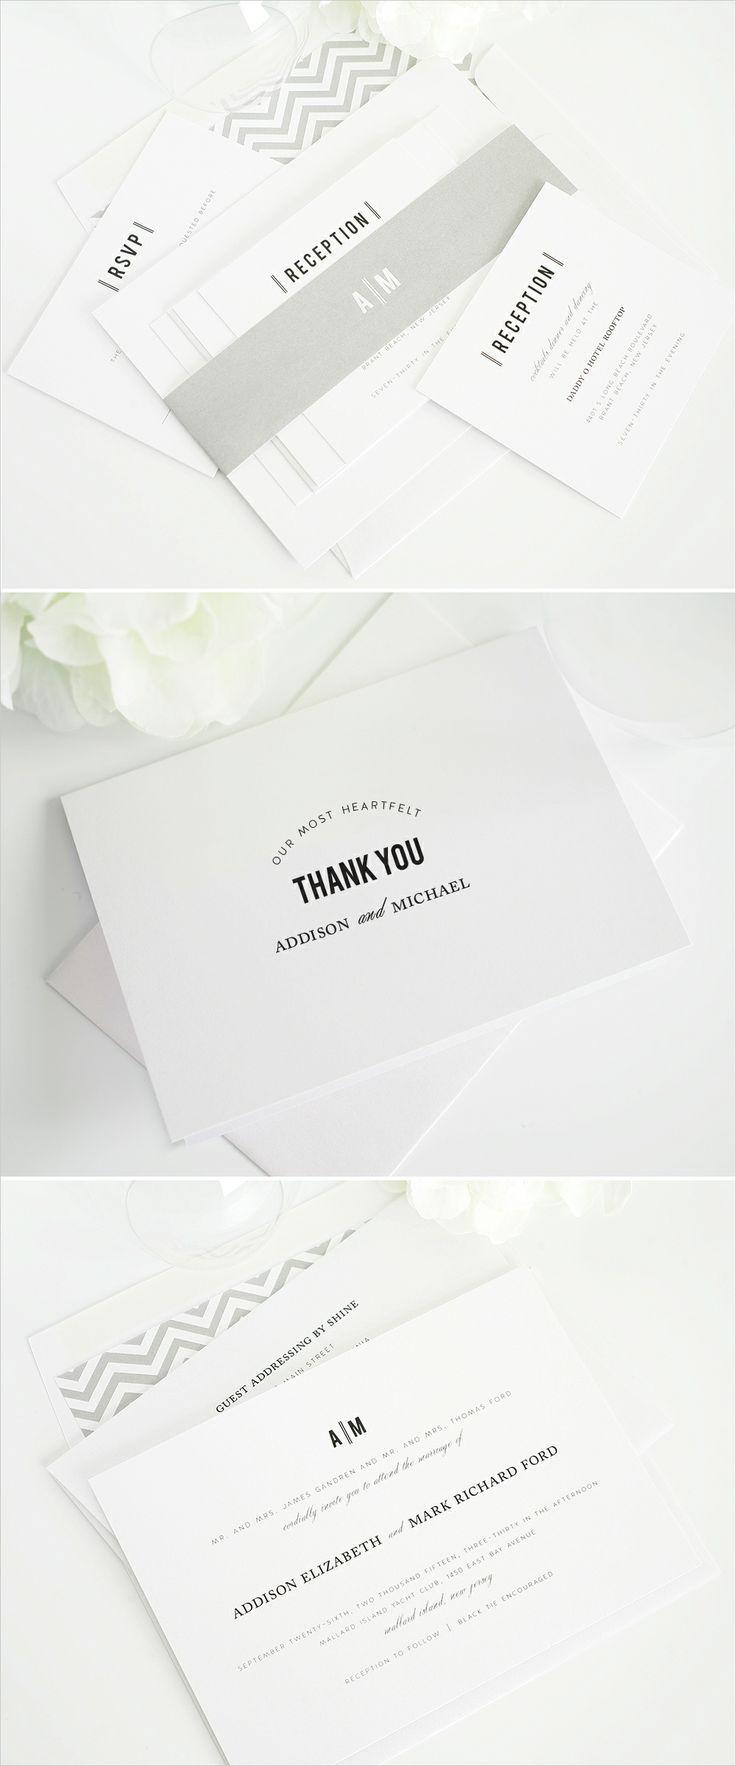 urban vintage wedding invitations #stationery #wedding #invitations #thankyou http://www.shineweddinginvitations.com/wedding-invitations/urban-vintage-wedding-invitations